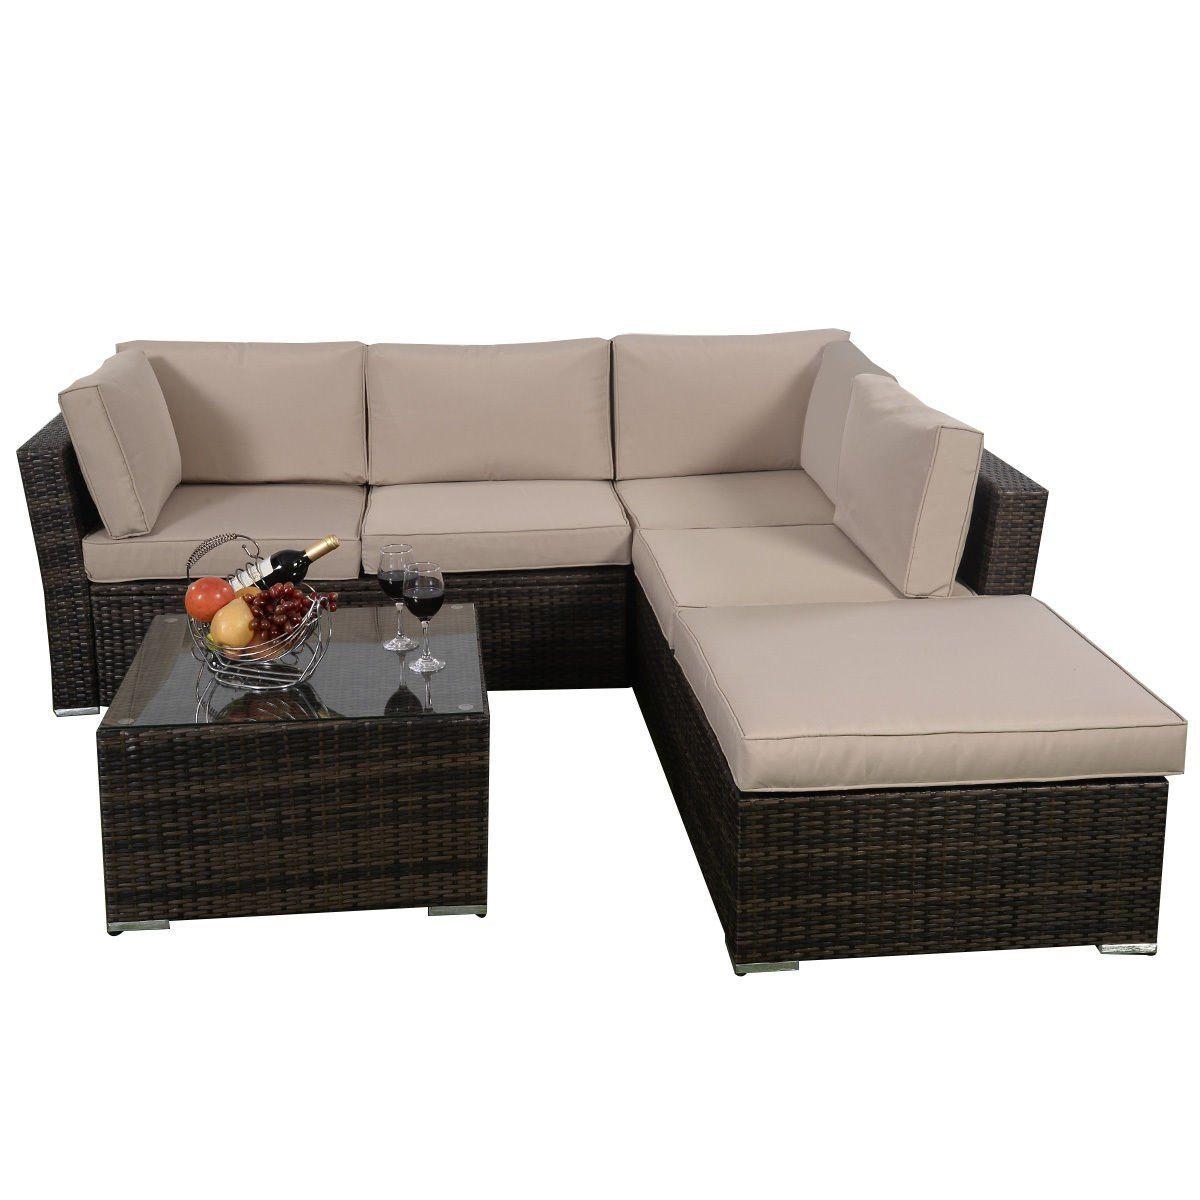 Pe Wicker: Giantex 4pc Patio Sectional Furniture Pe Wicker Rattan